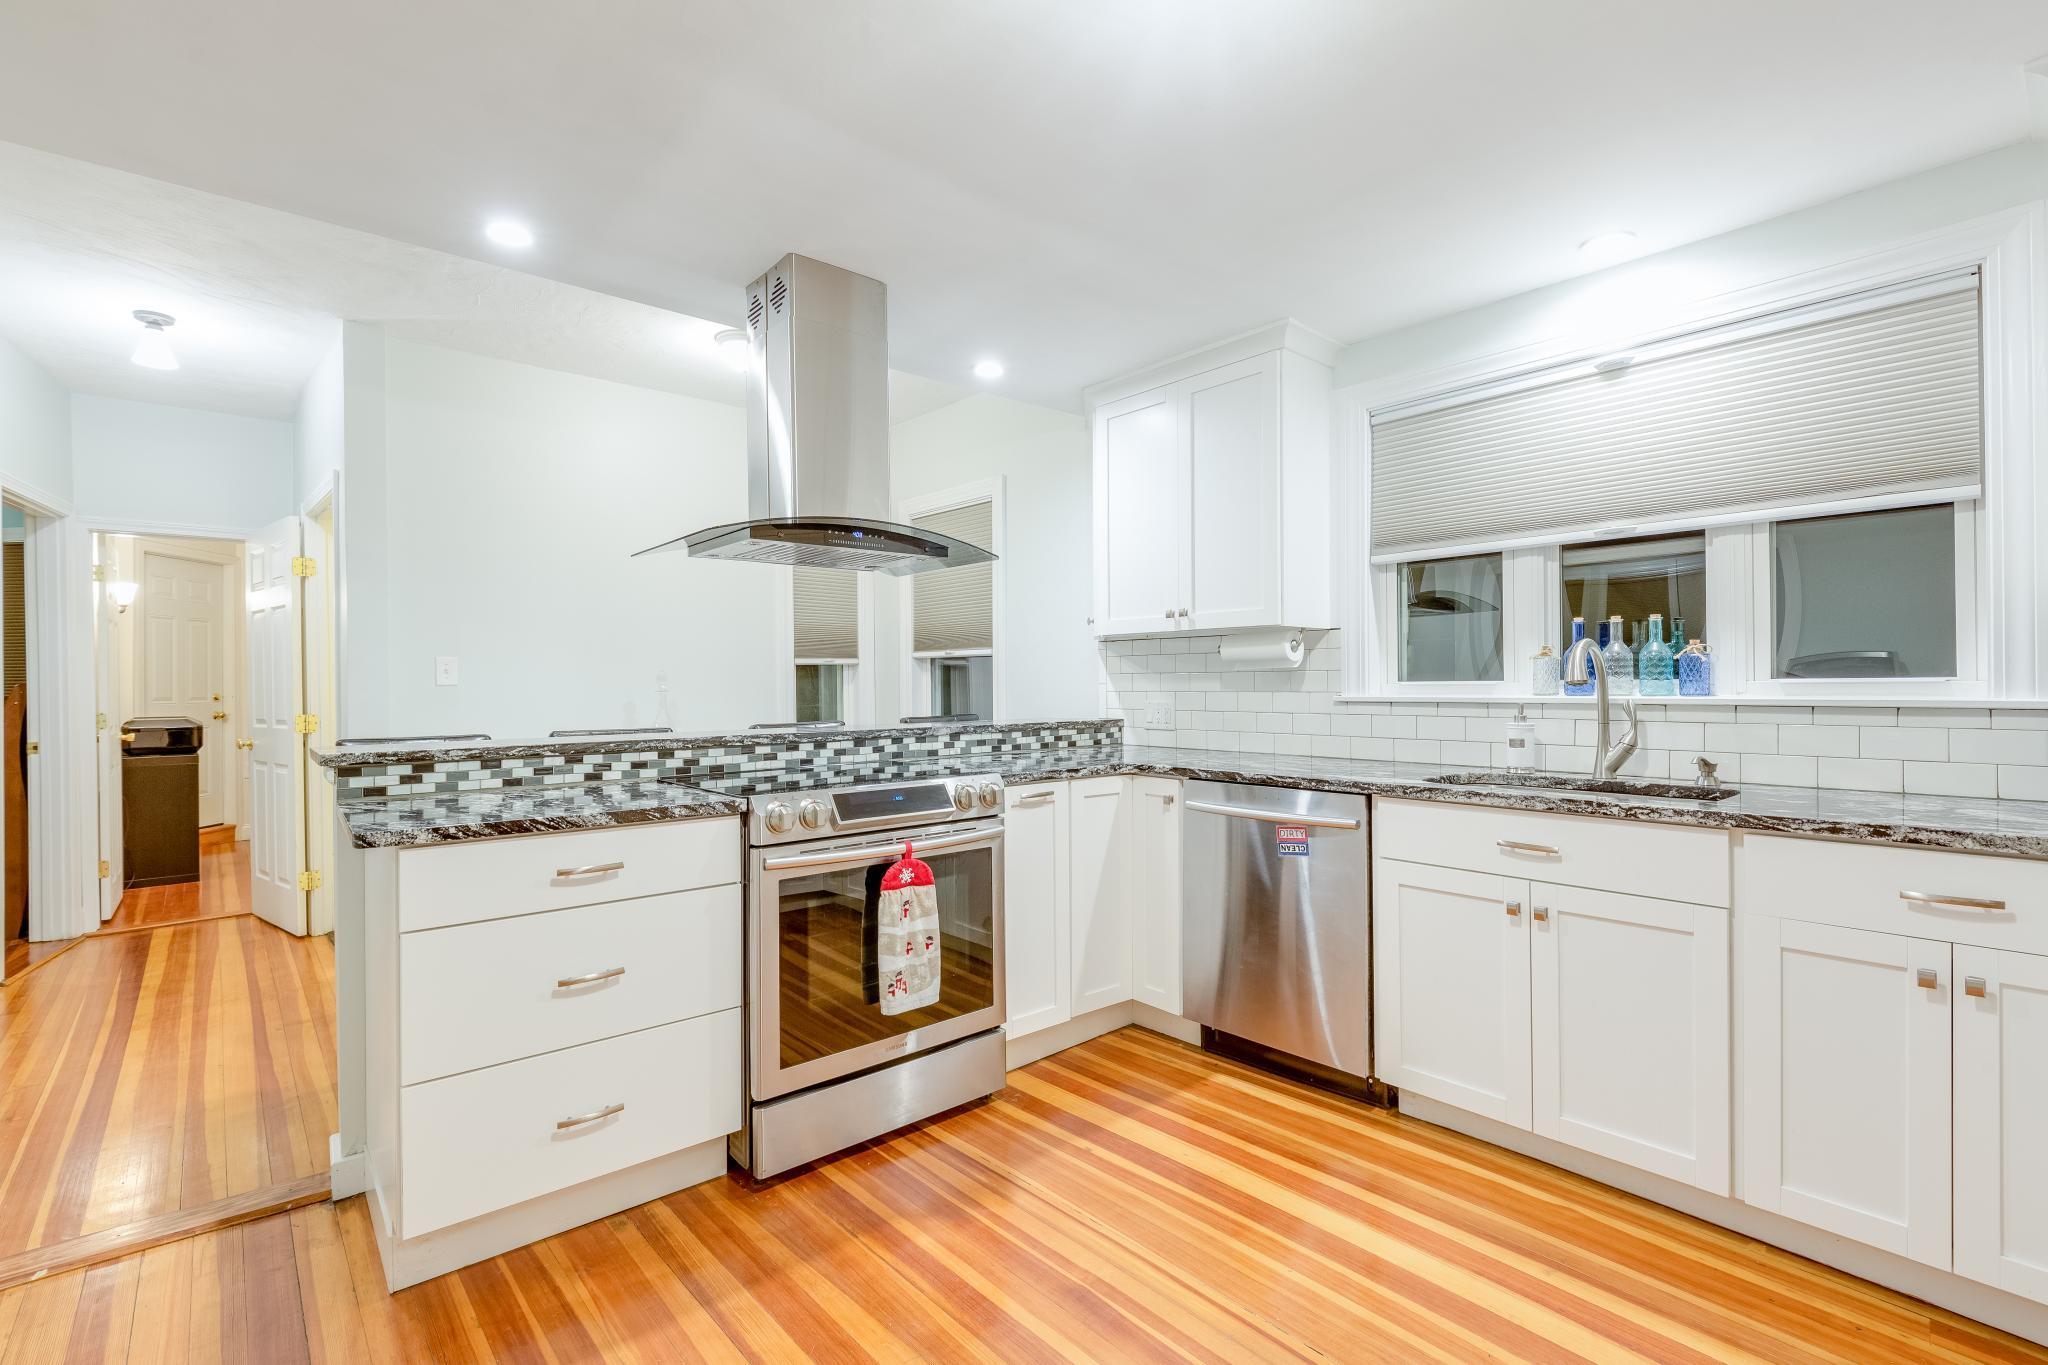 80 Dexter St #2 For Rent - Medford, MA | Trulia